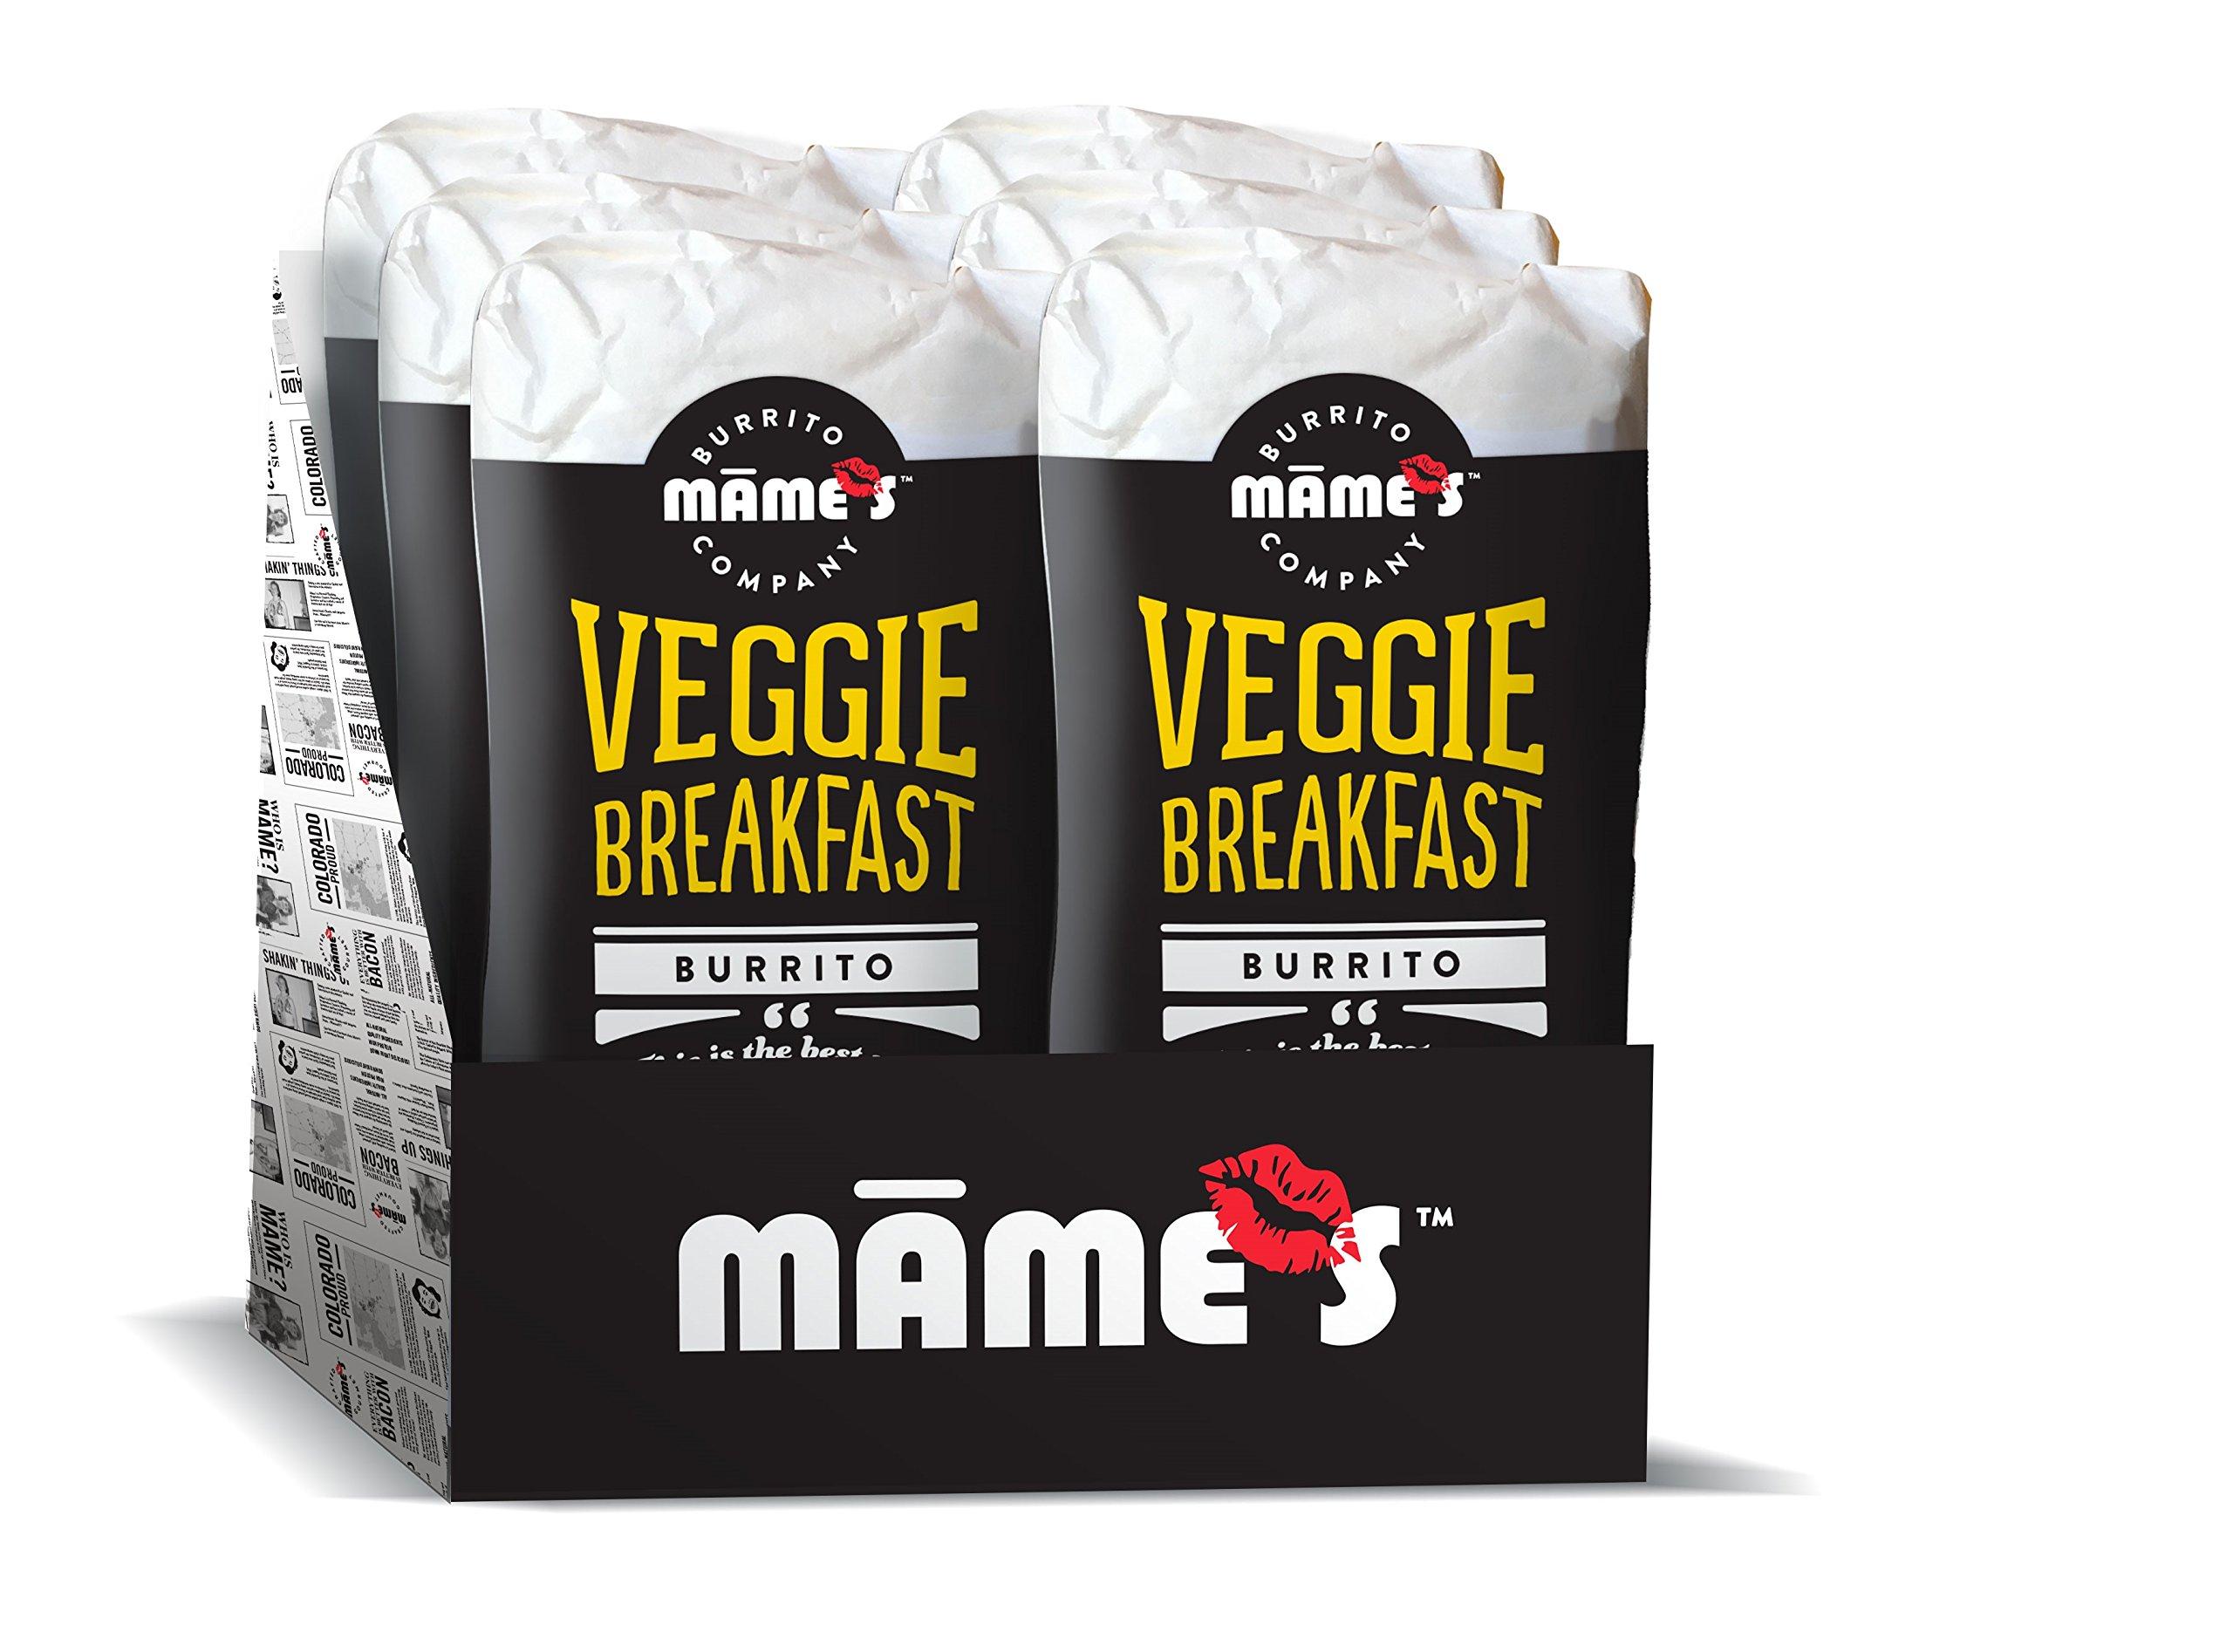 Mame's Burrito Company Veggie Breakfast Burrito, 7 Ounce (Pack of 12) by Mame's Burrito Company